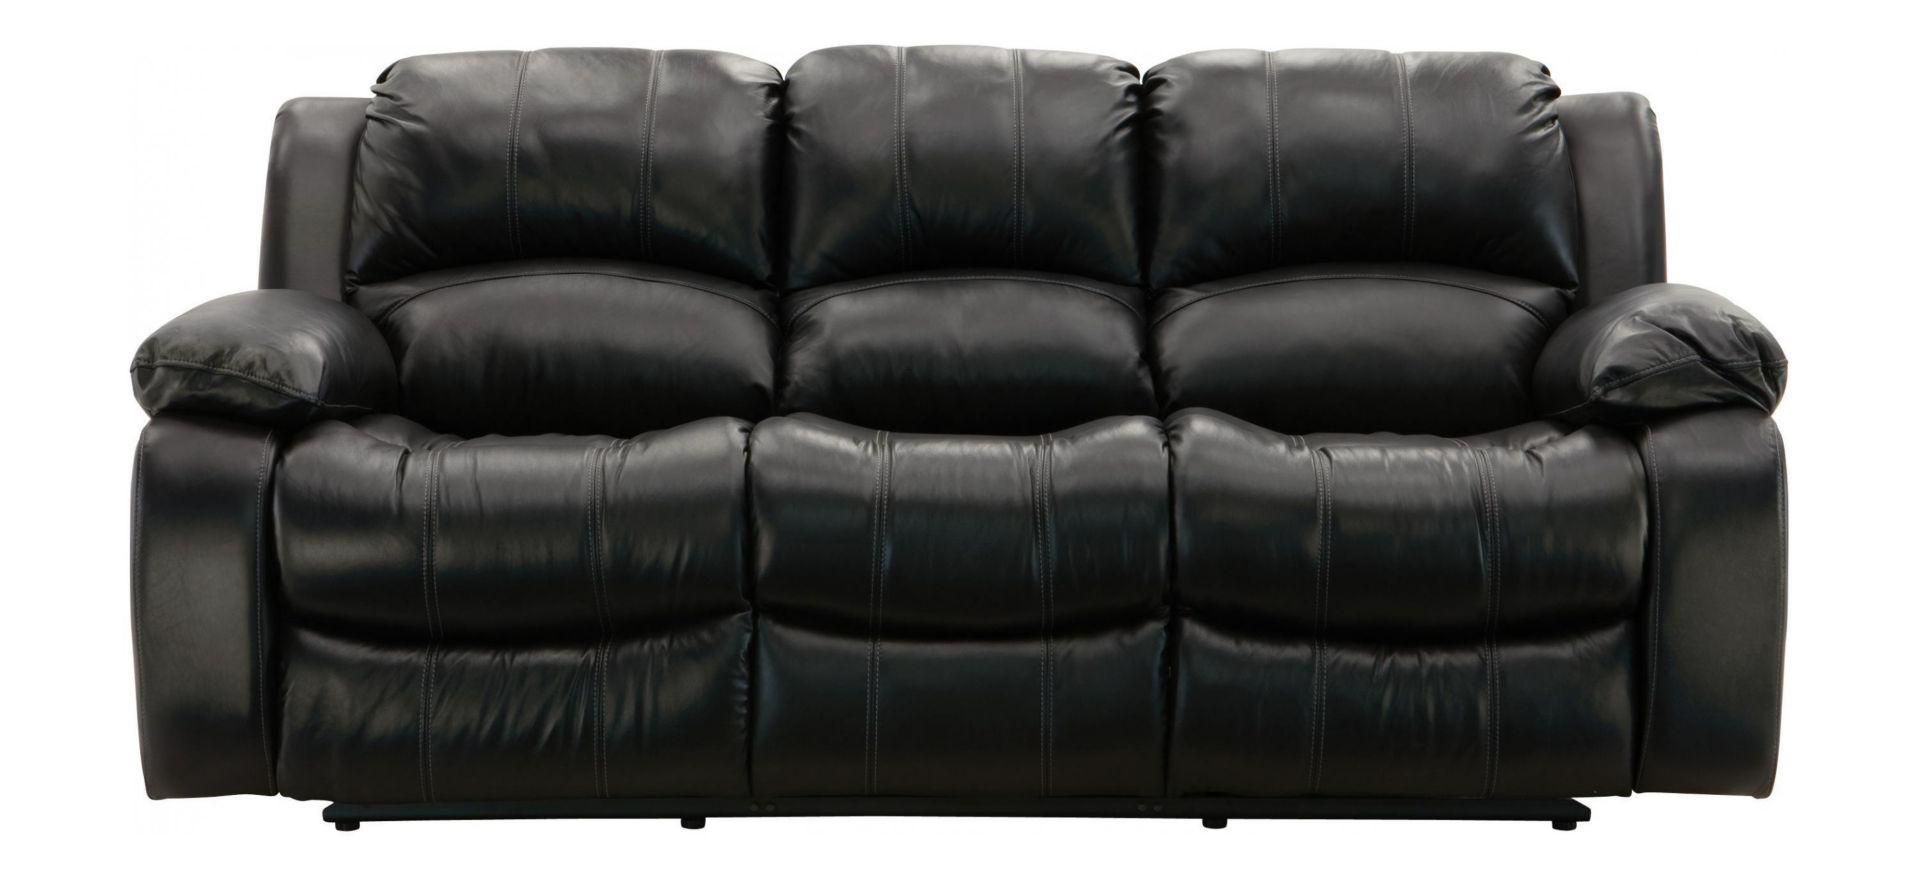 Raymour & Flanigan Black Leather Reclining 3-Seater Sofa ...